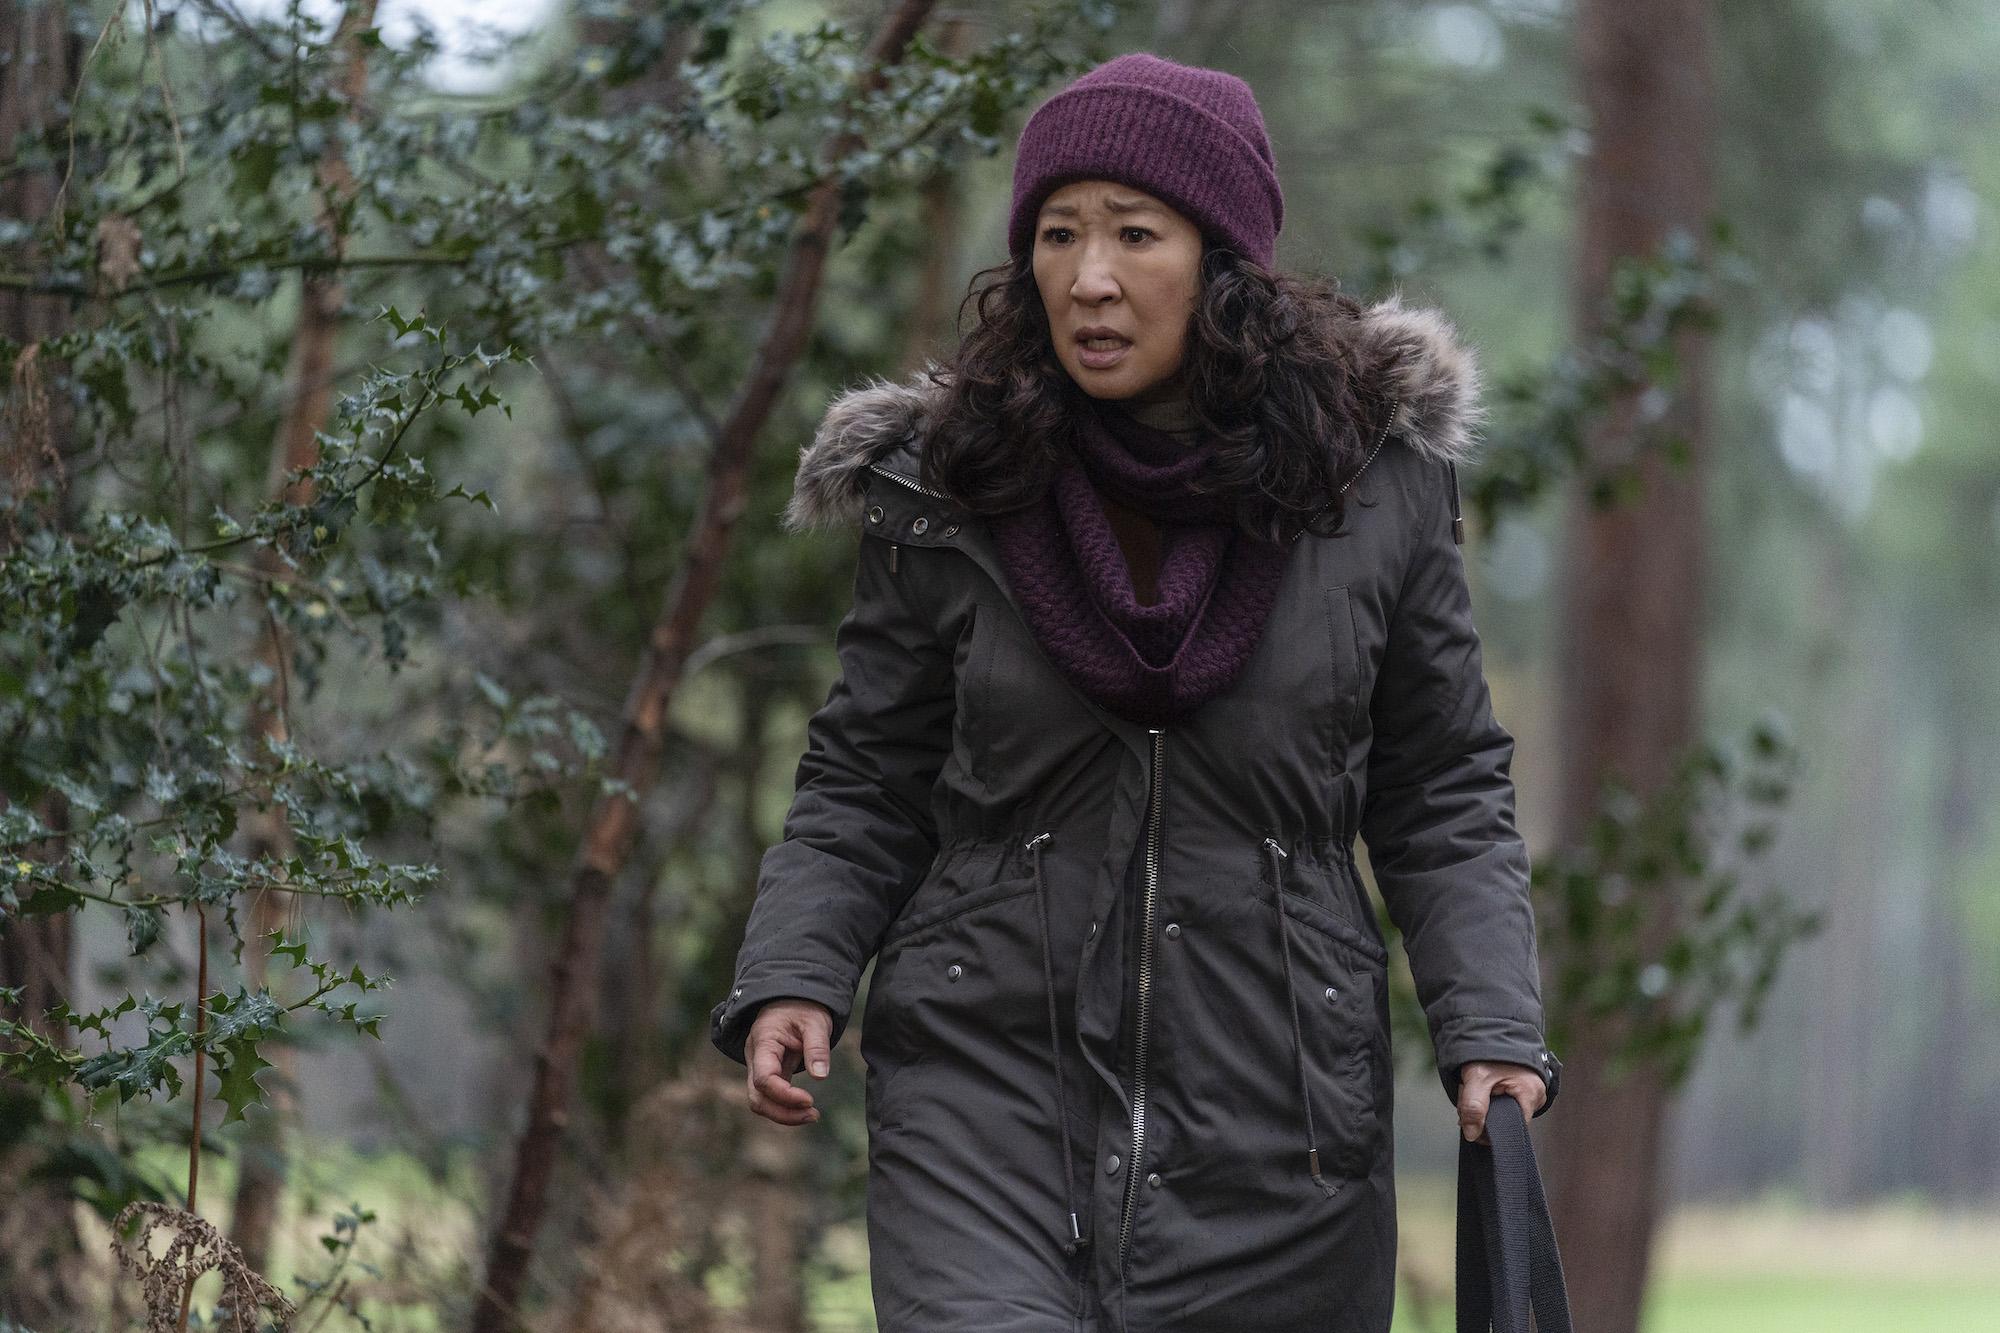 Sandra Oh as Eve Polastri comes across Dasha in Season 3 of 'Killing Eve'